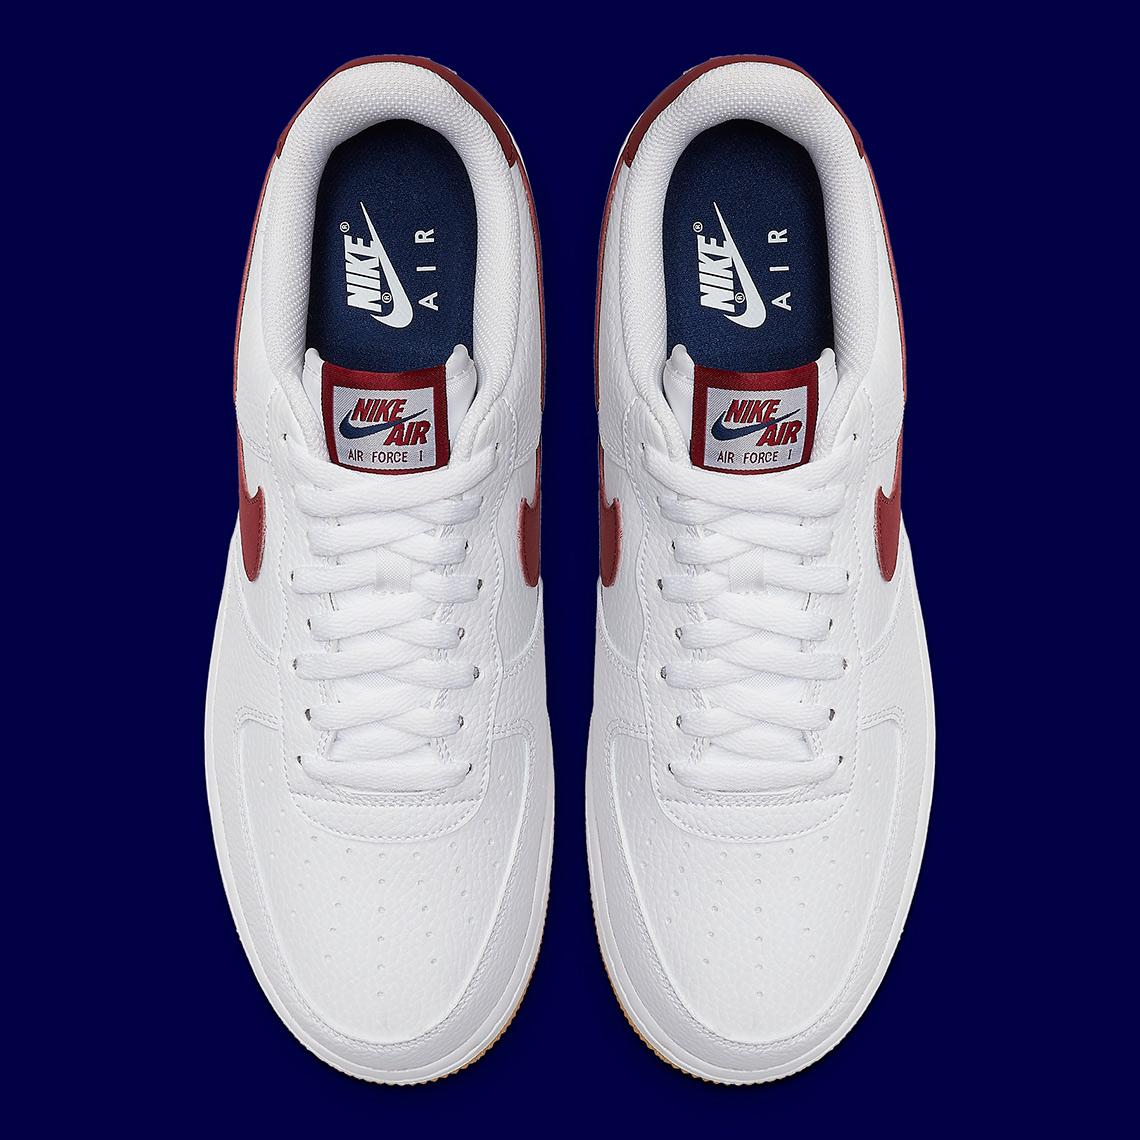 Nike Air Force 1 Low White Gum Blue Void CI0057 101